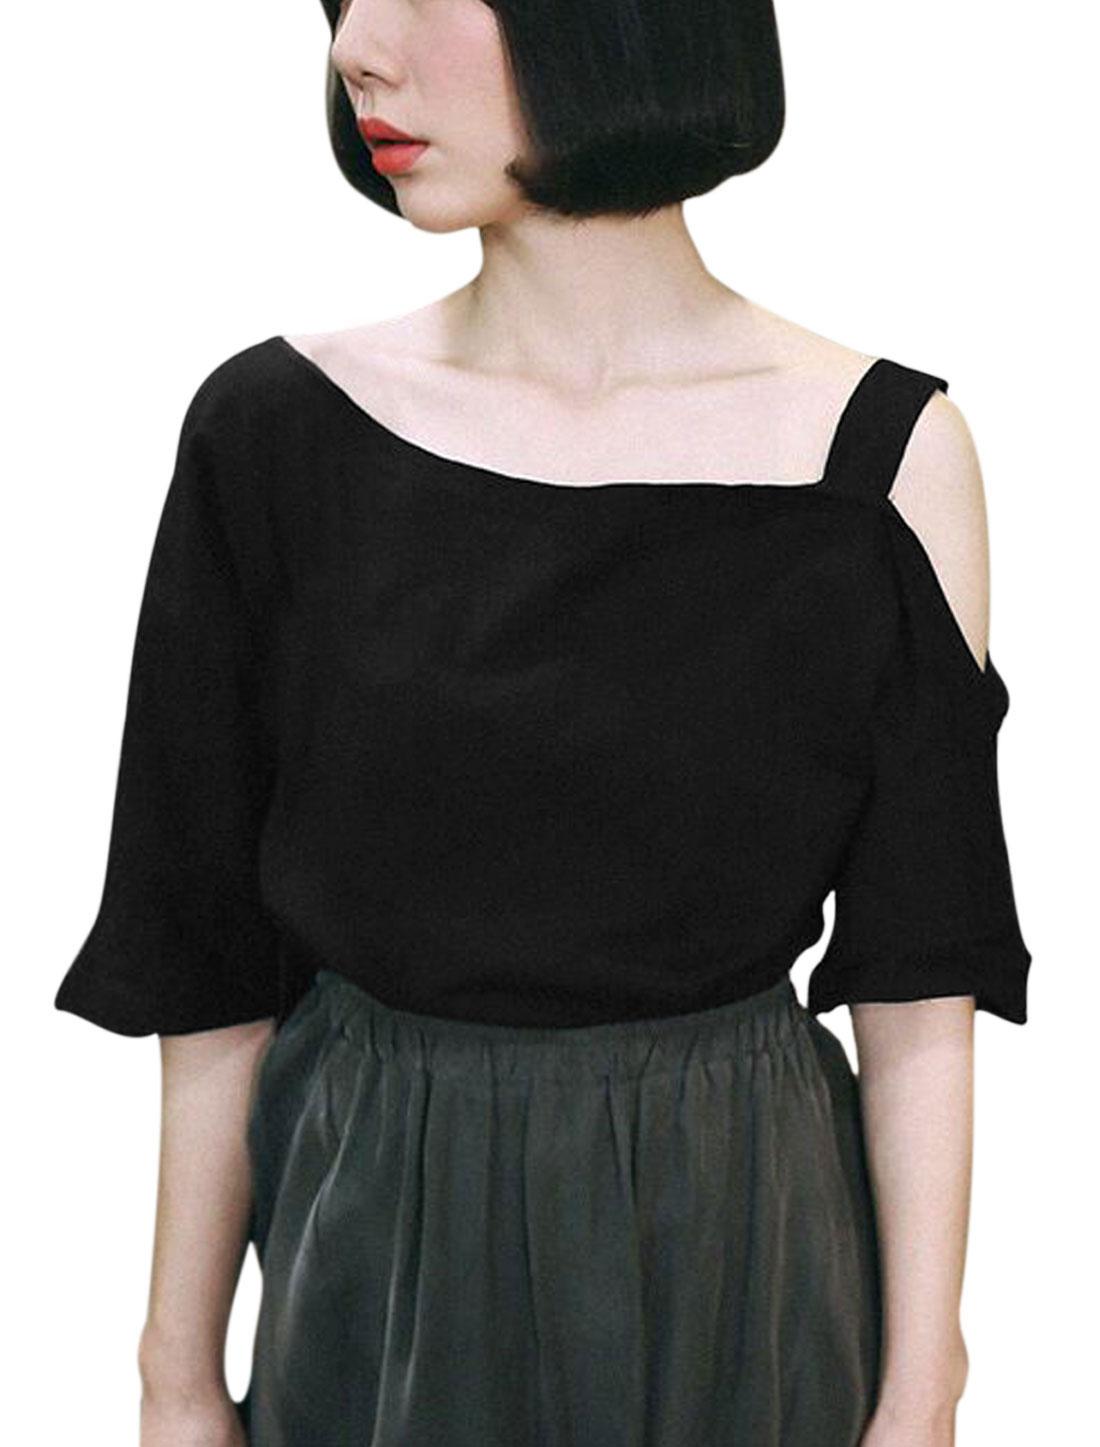 Women One Cut Out Shoulder Asymmetric Neck Casual Tee Black M